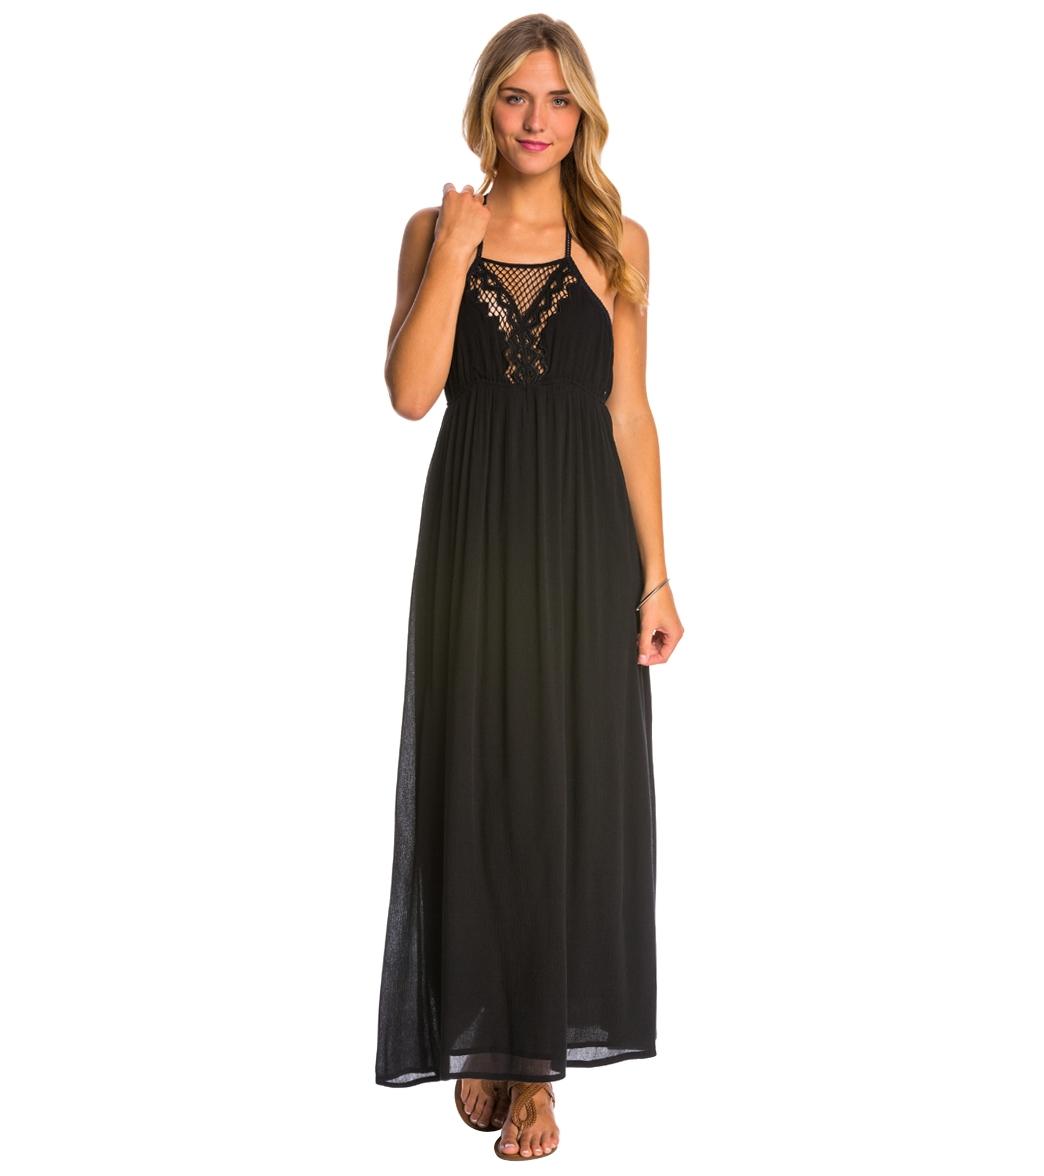 Rip Curl Vagabond Maxi Dress at SwimOutlet.com - Free Shipping